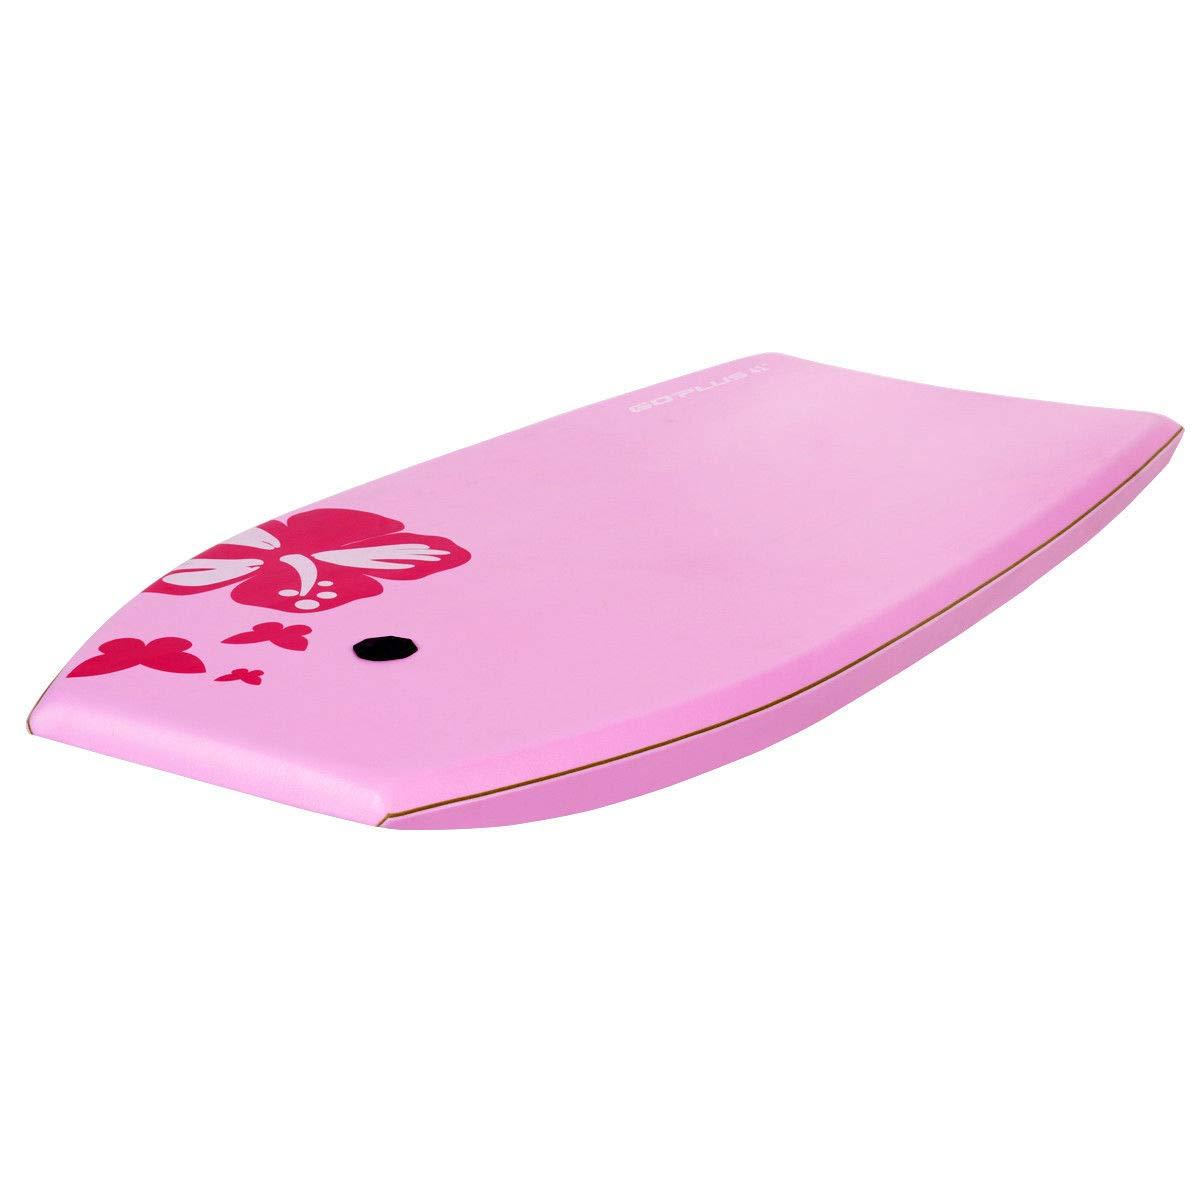 oldzon Bodyboard Surfing 41'' Lightweight Super w/Leash EPS Core Boarding Pink with Ebook